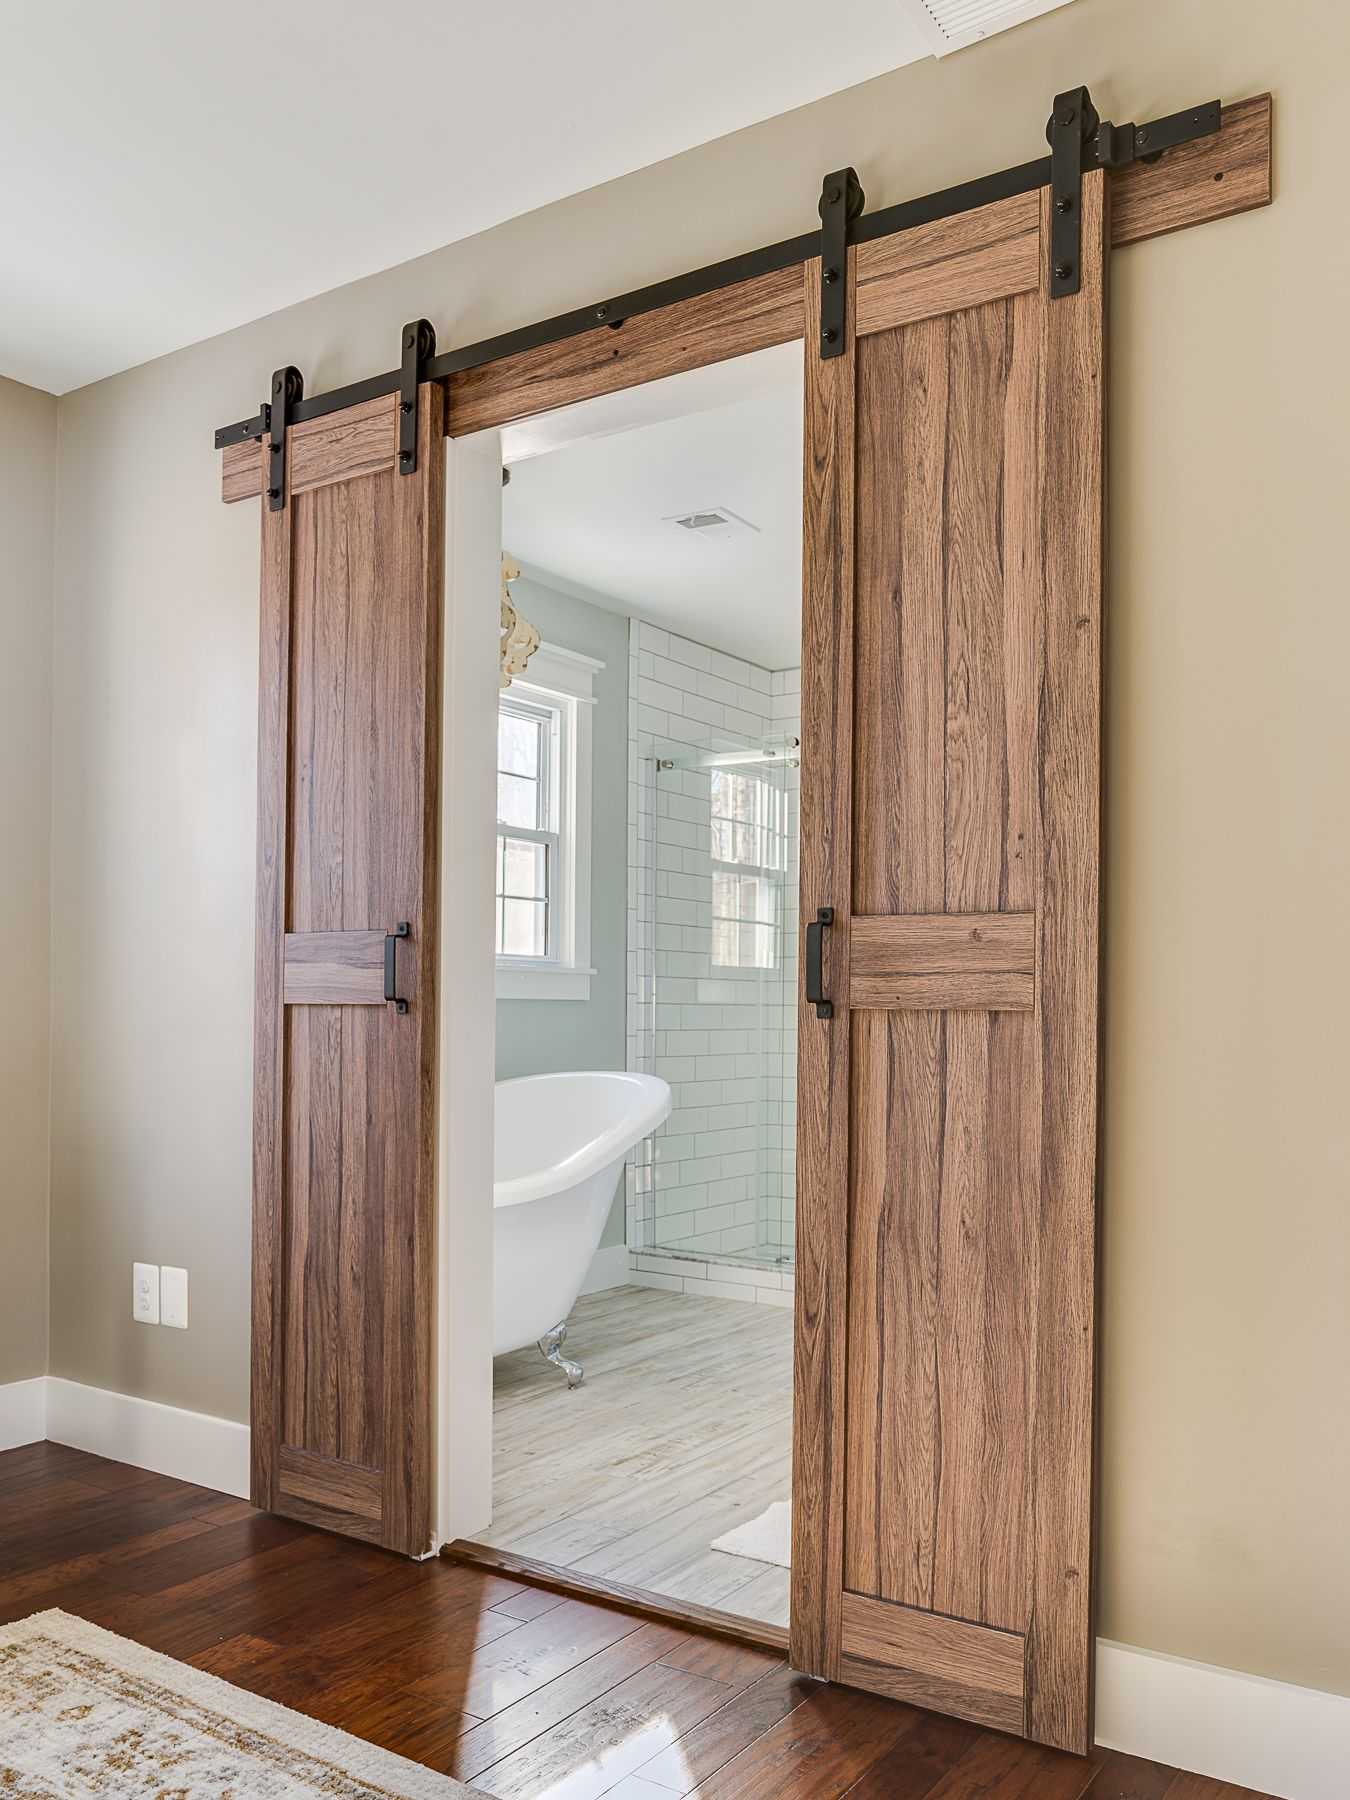 Barn doors leading into master bathroom in a modern